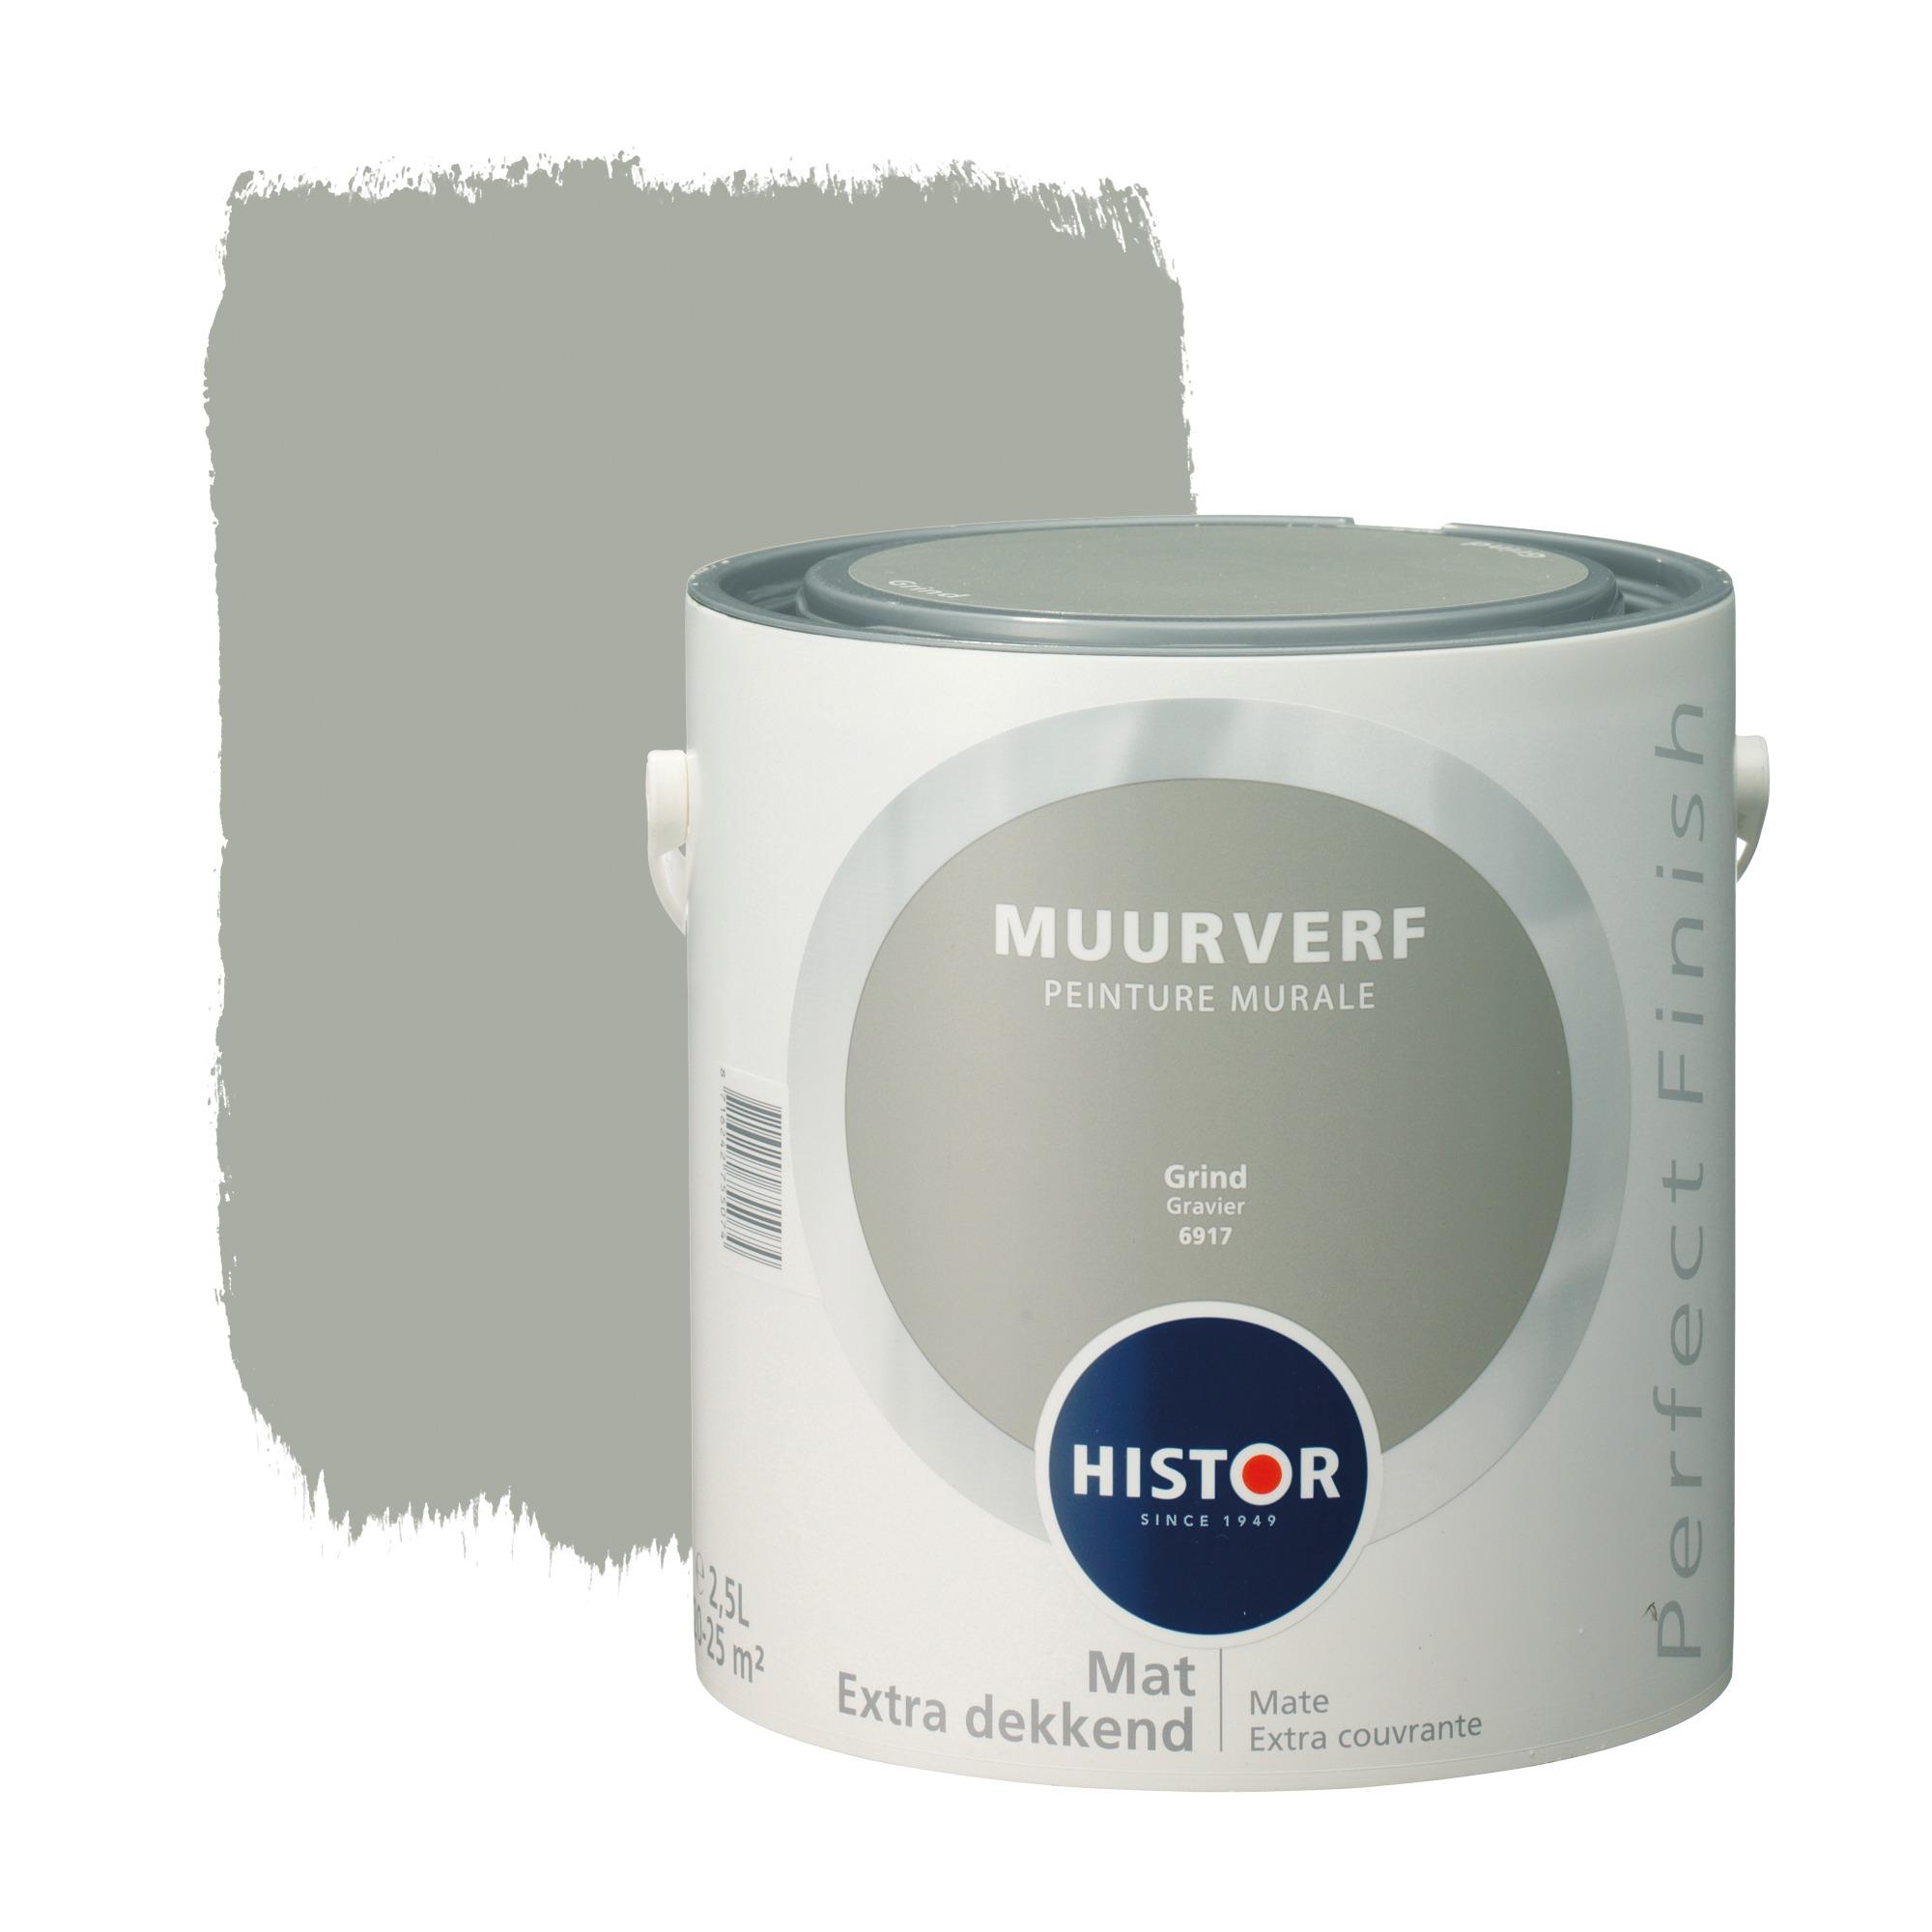 Histor perfect finish muurverf mat grind 6917 2,5 l